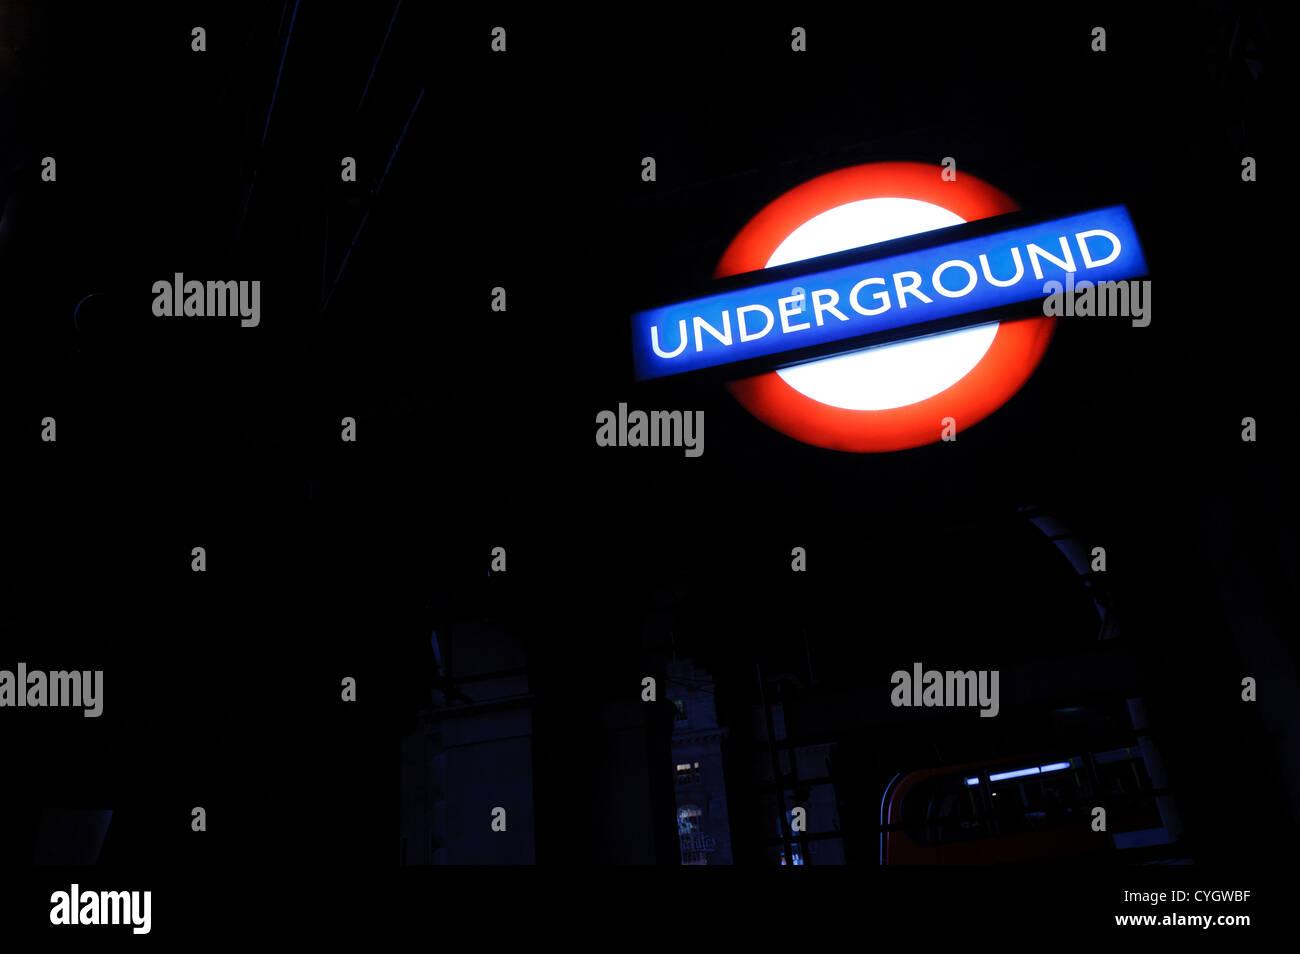 London Underground sign at night Photo Stock